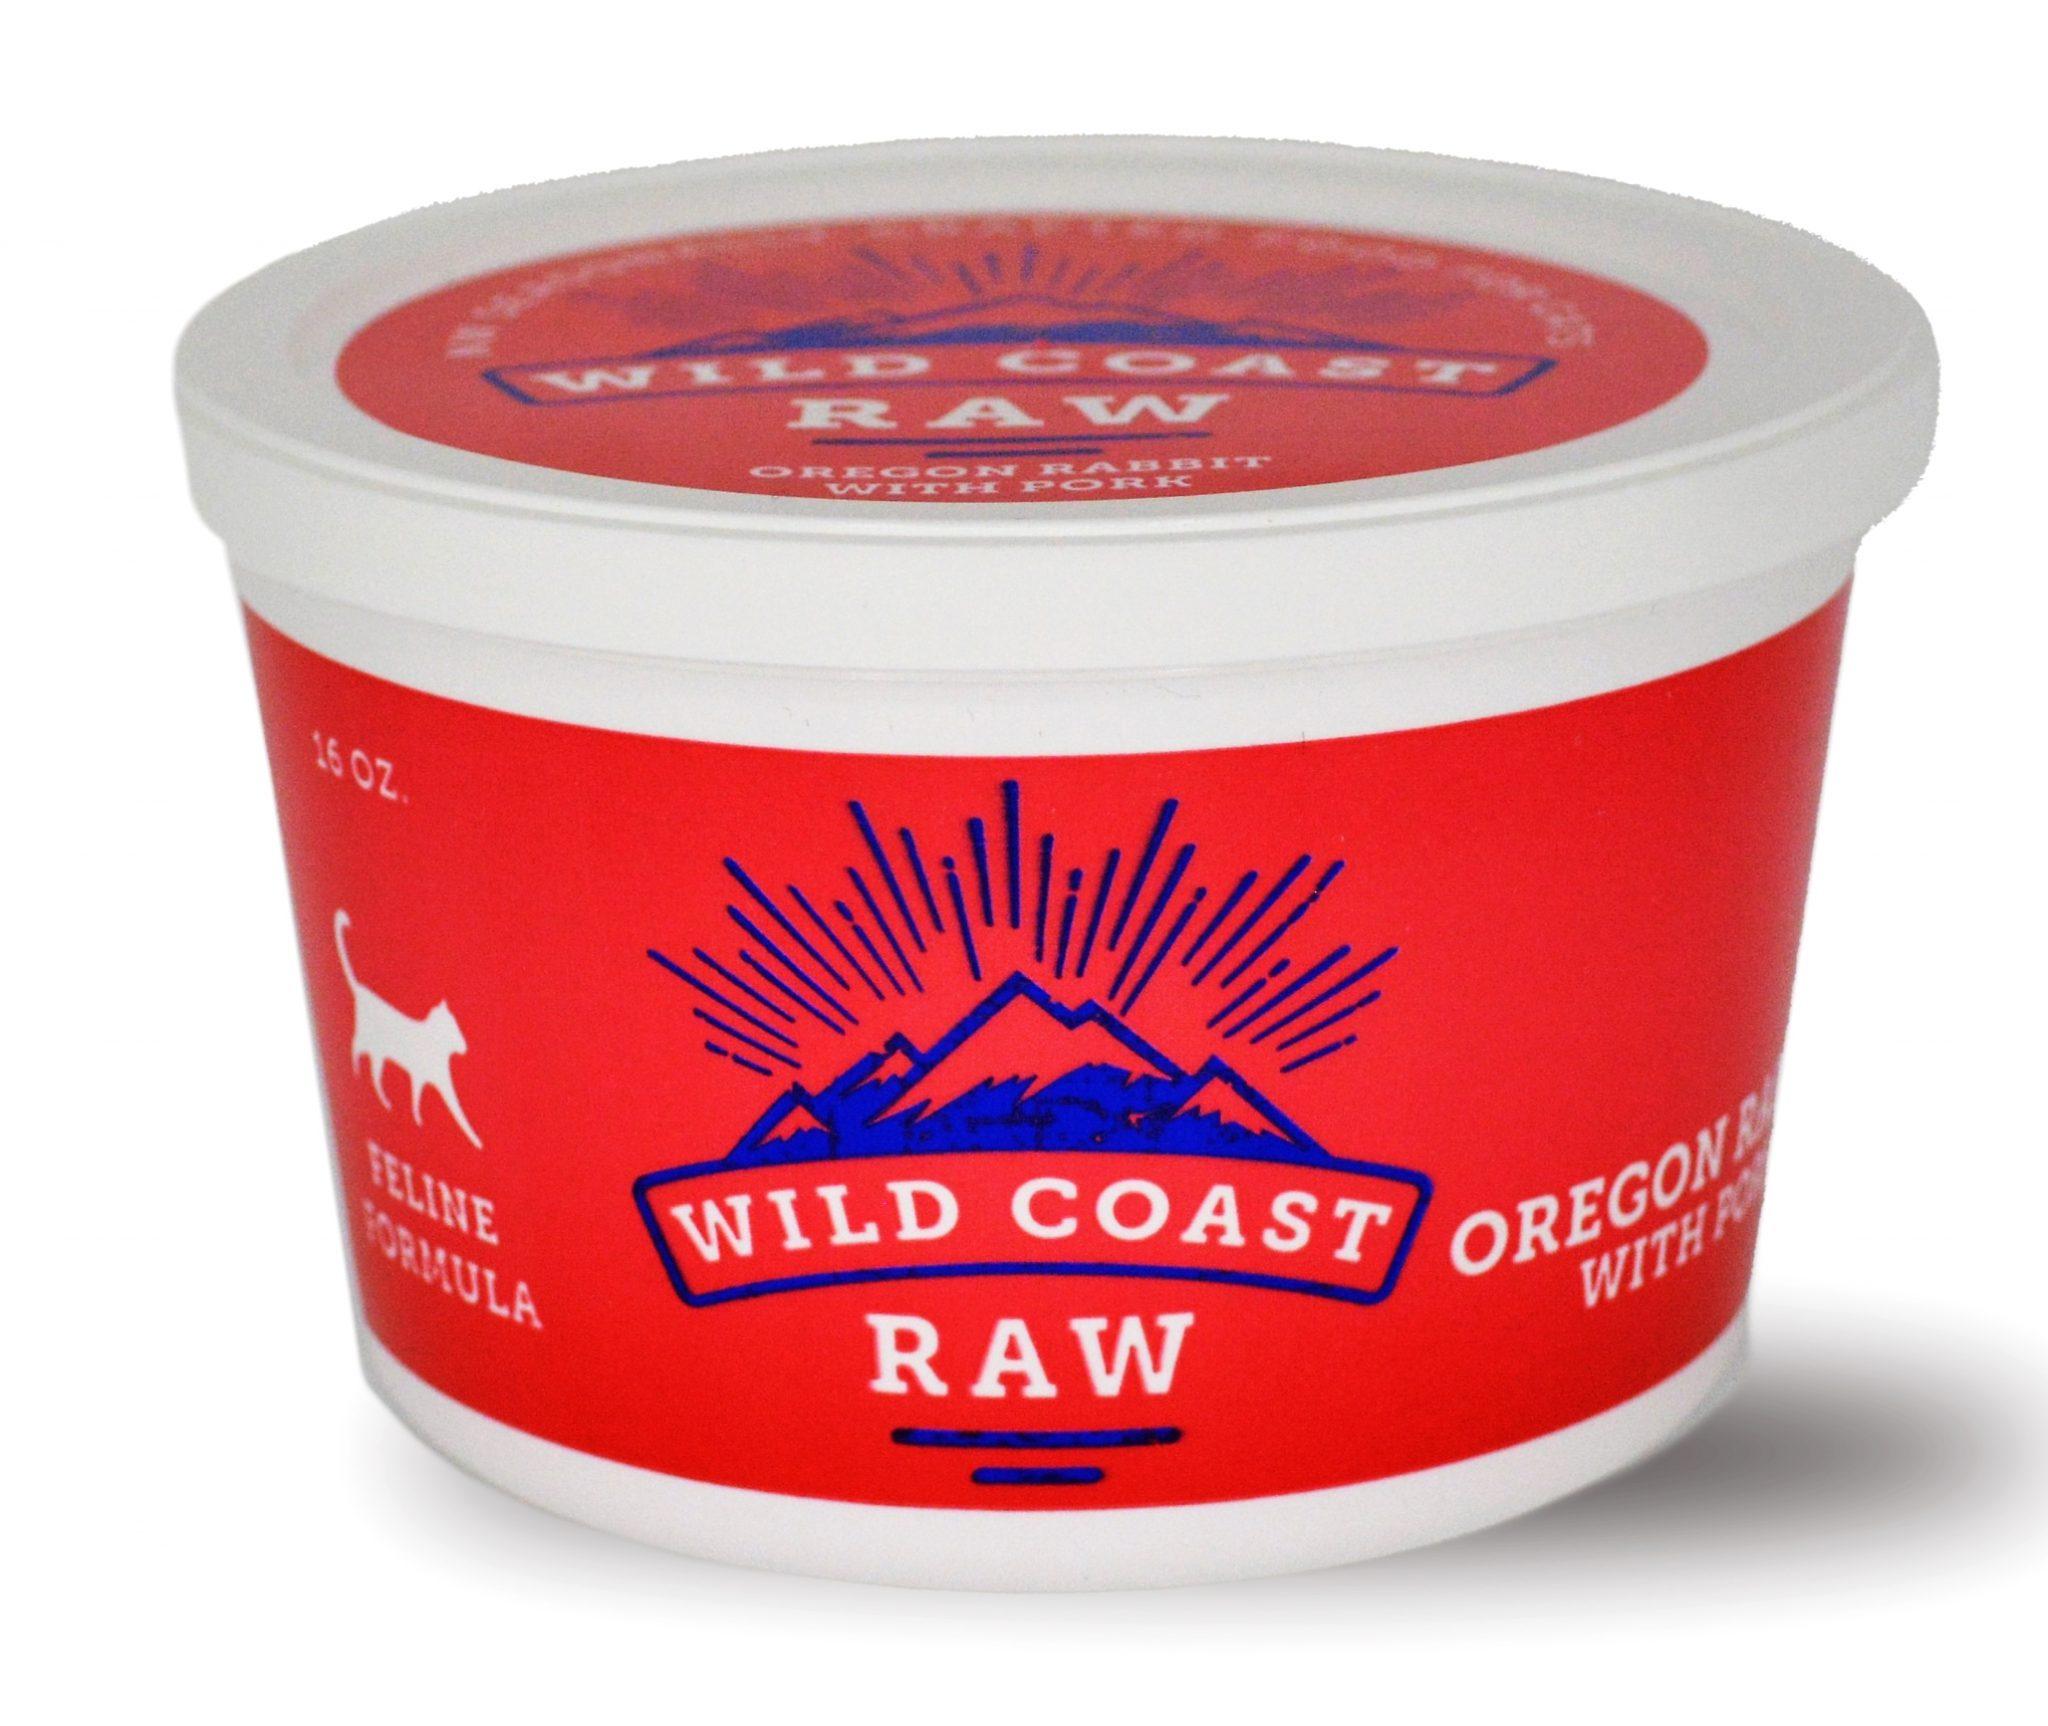 Wild Coast Raw Farm Raised Rabbit & Pork Raw Frozen Cat Food, 1-lb